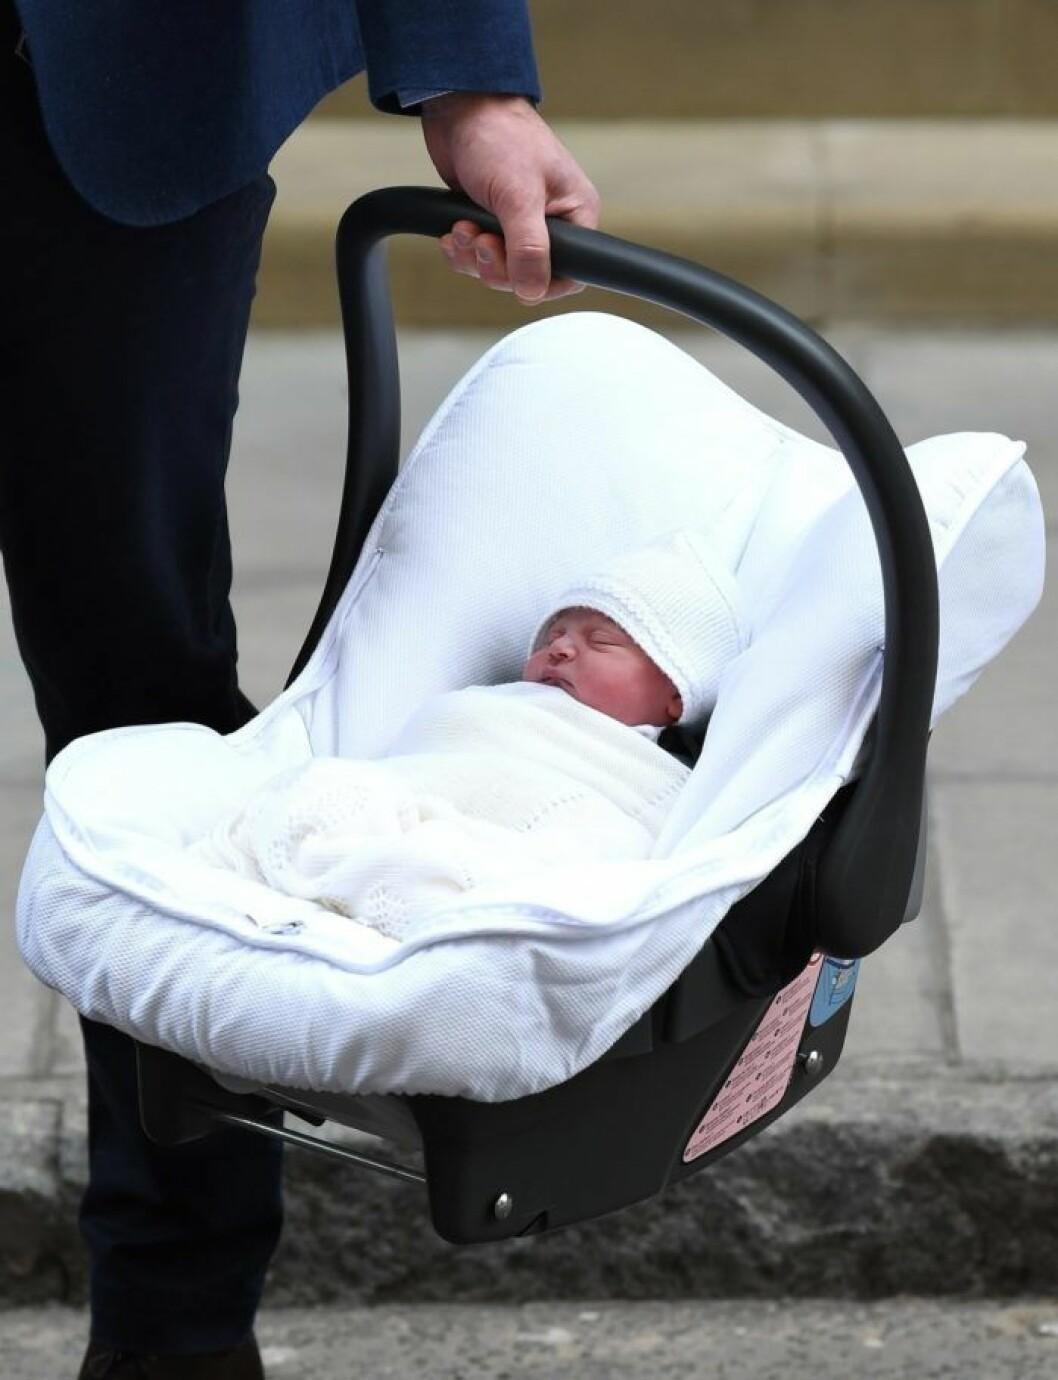 Nyfödd Prins Louis i babyskydd